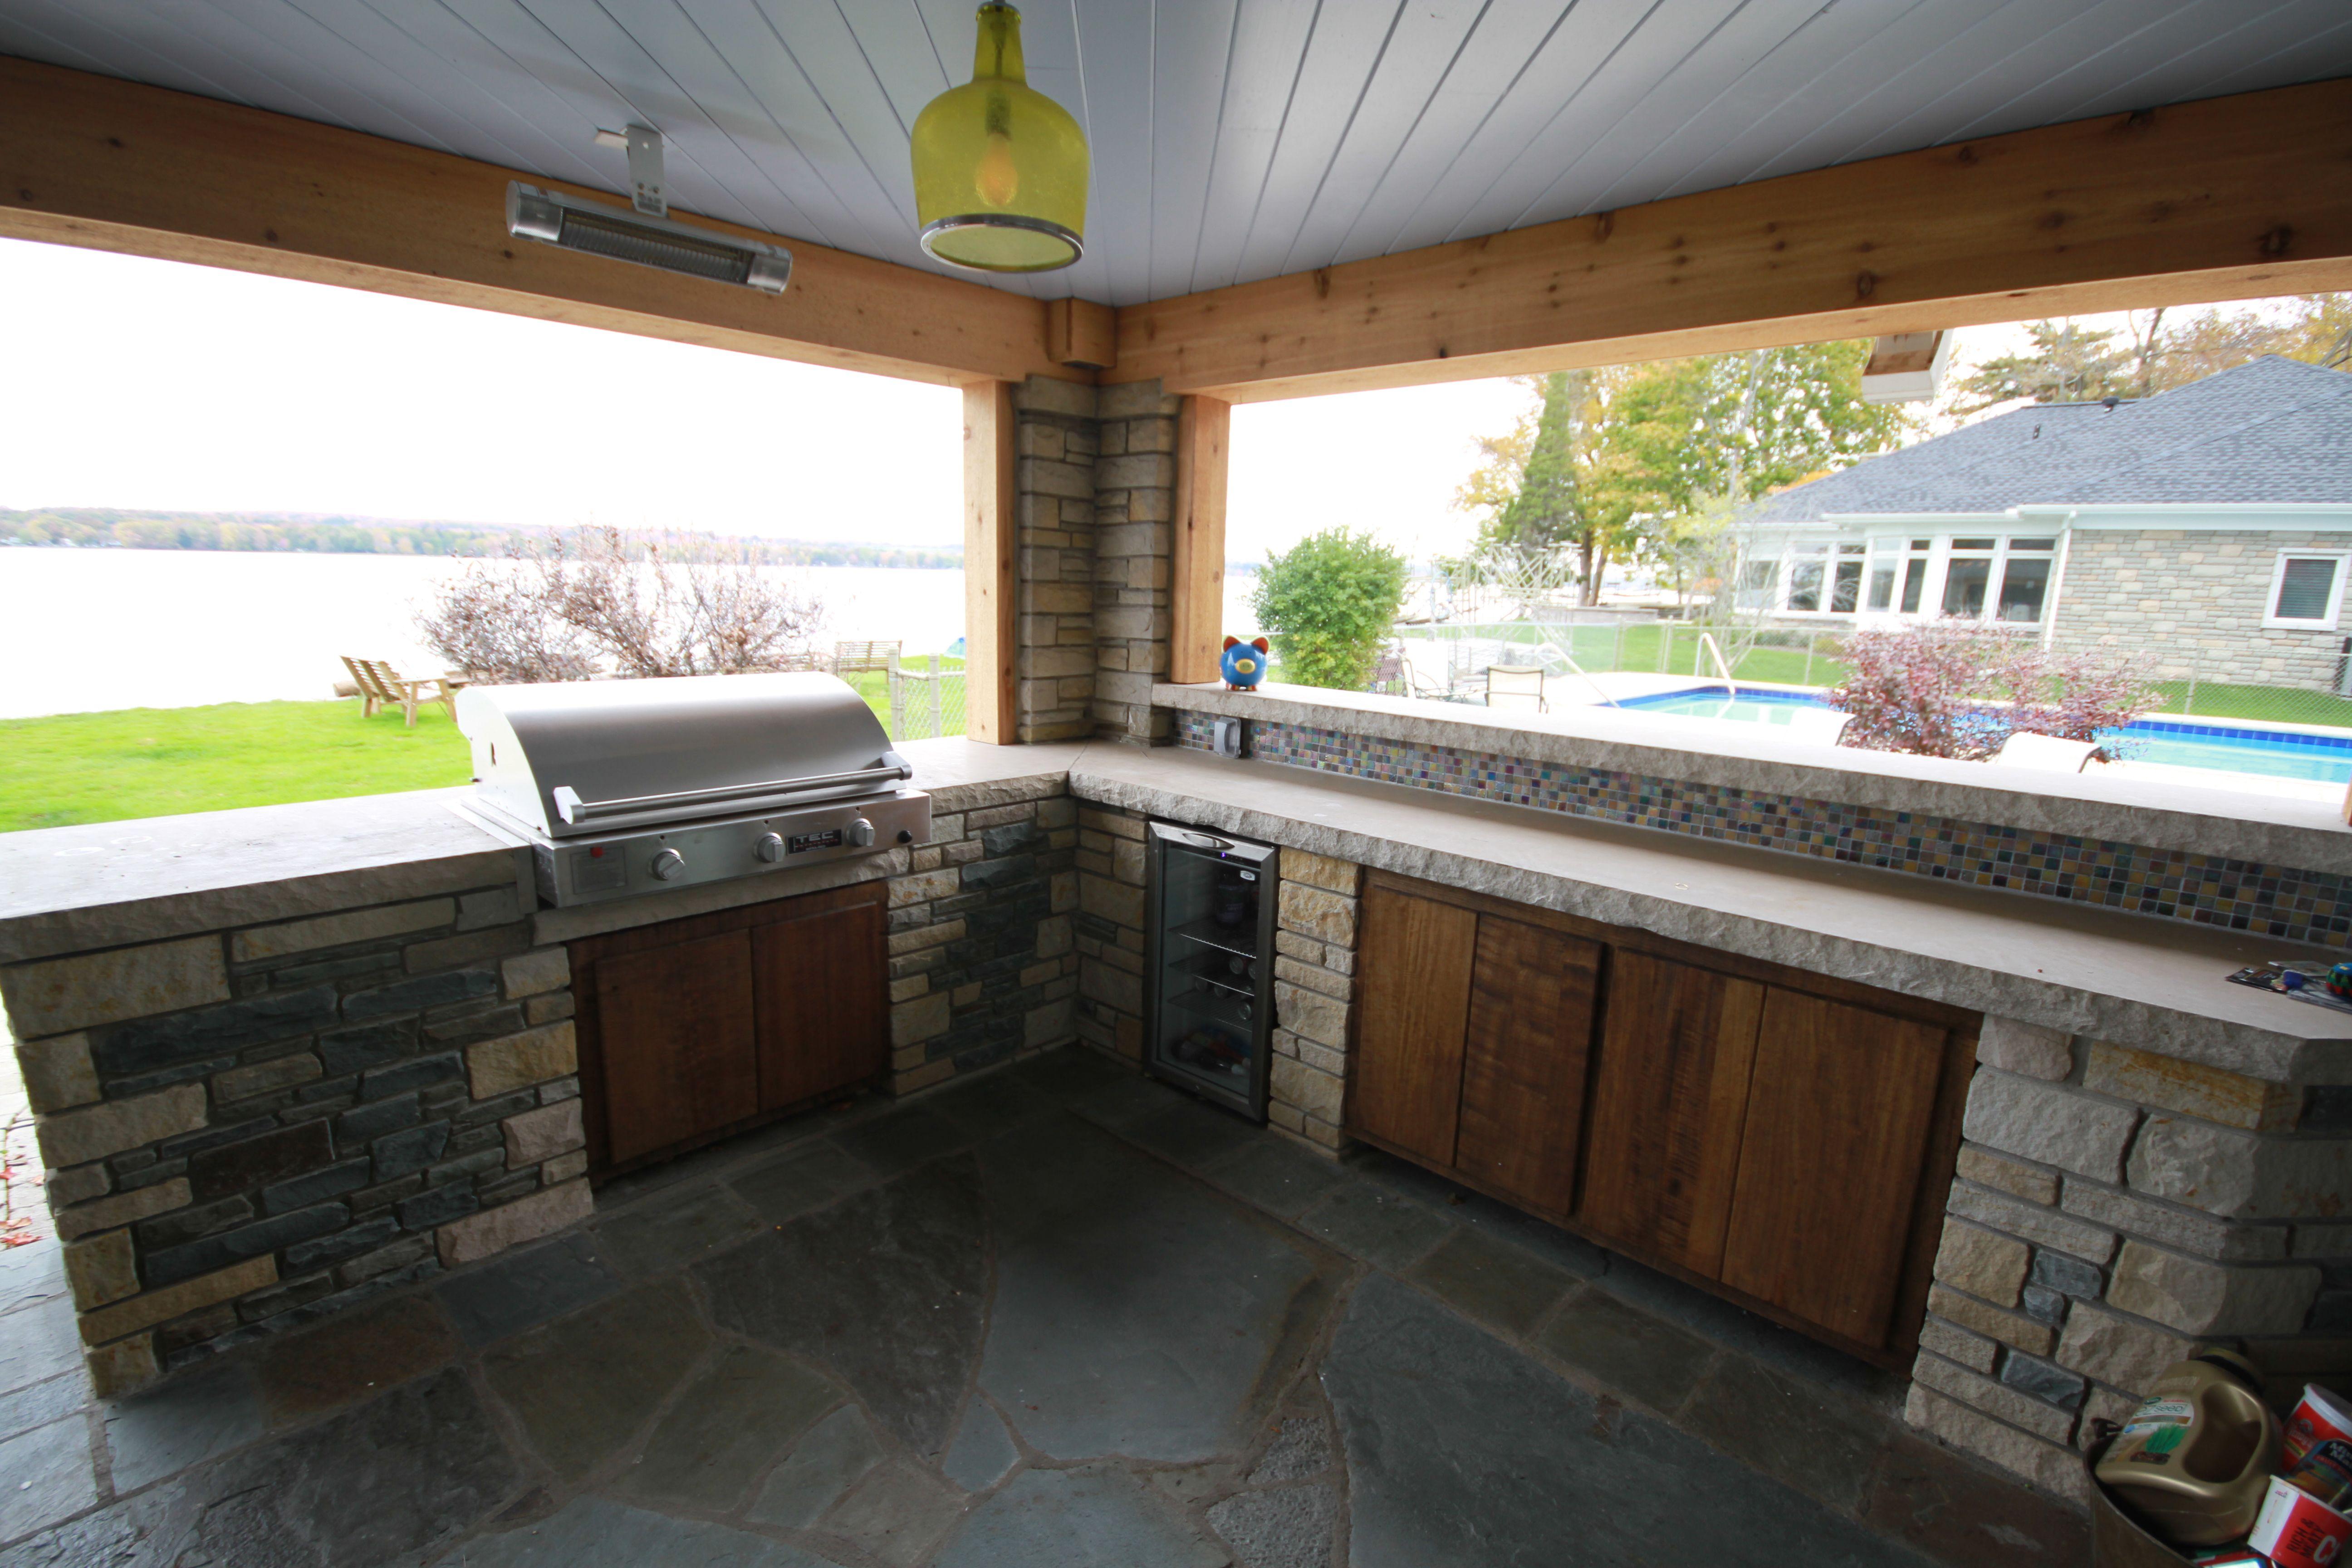 Outdoor Bar and Kitchen on Lake Chautauqua. Sivak Stone Masonry